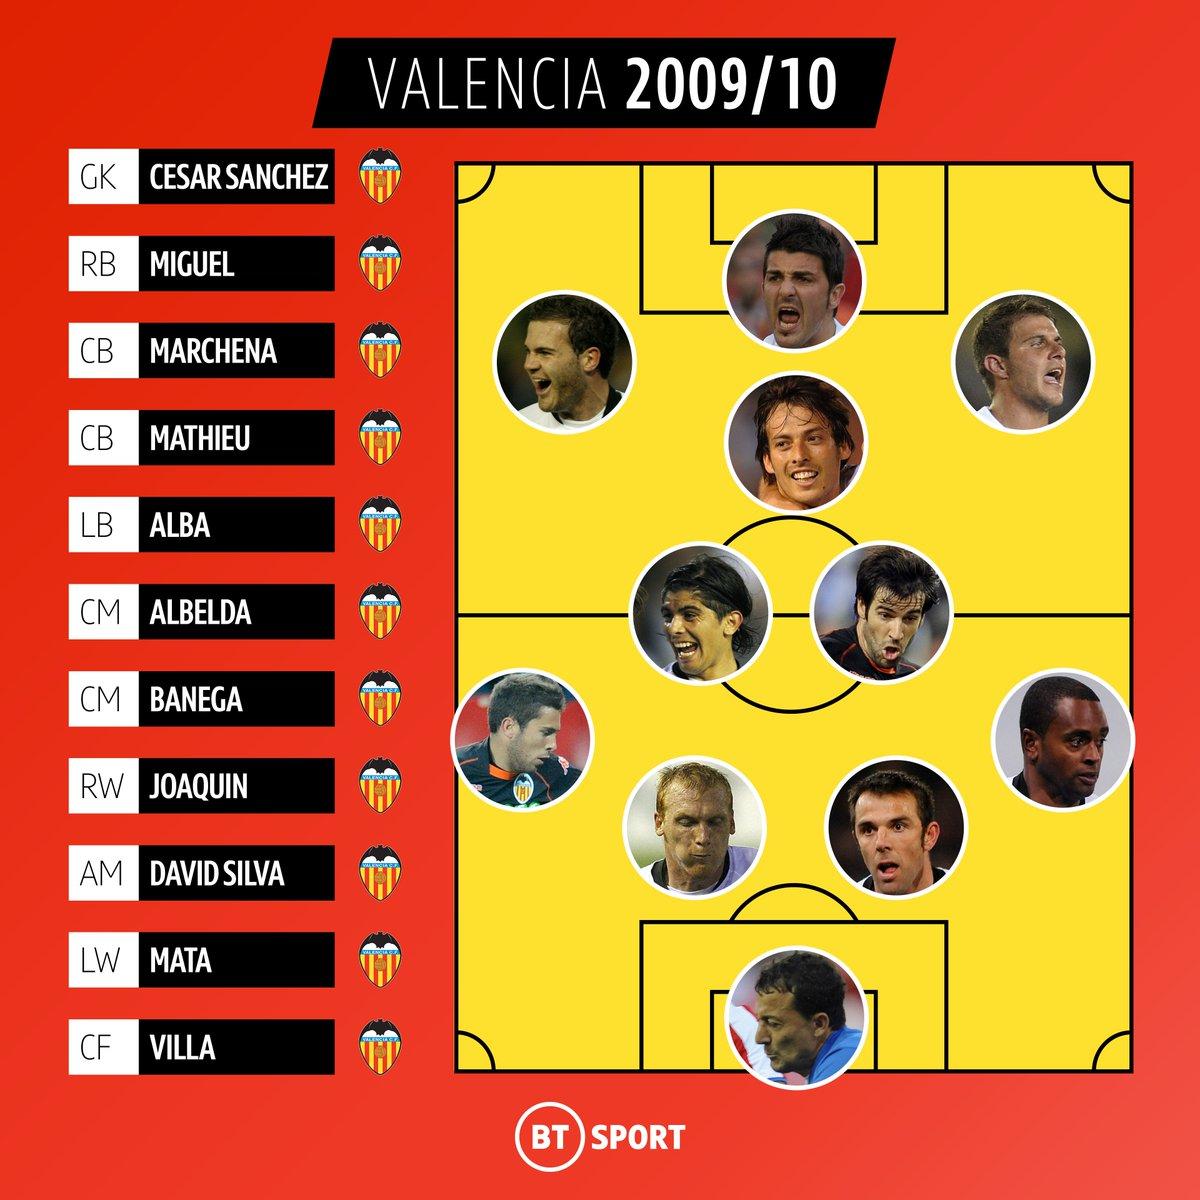 Villa x Silva x Mata That 2010 Valencia side was a lot of fun! All with Unai Emery at the helm.